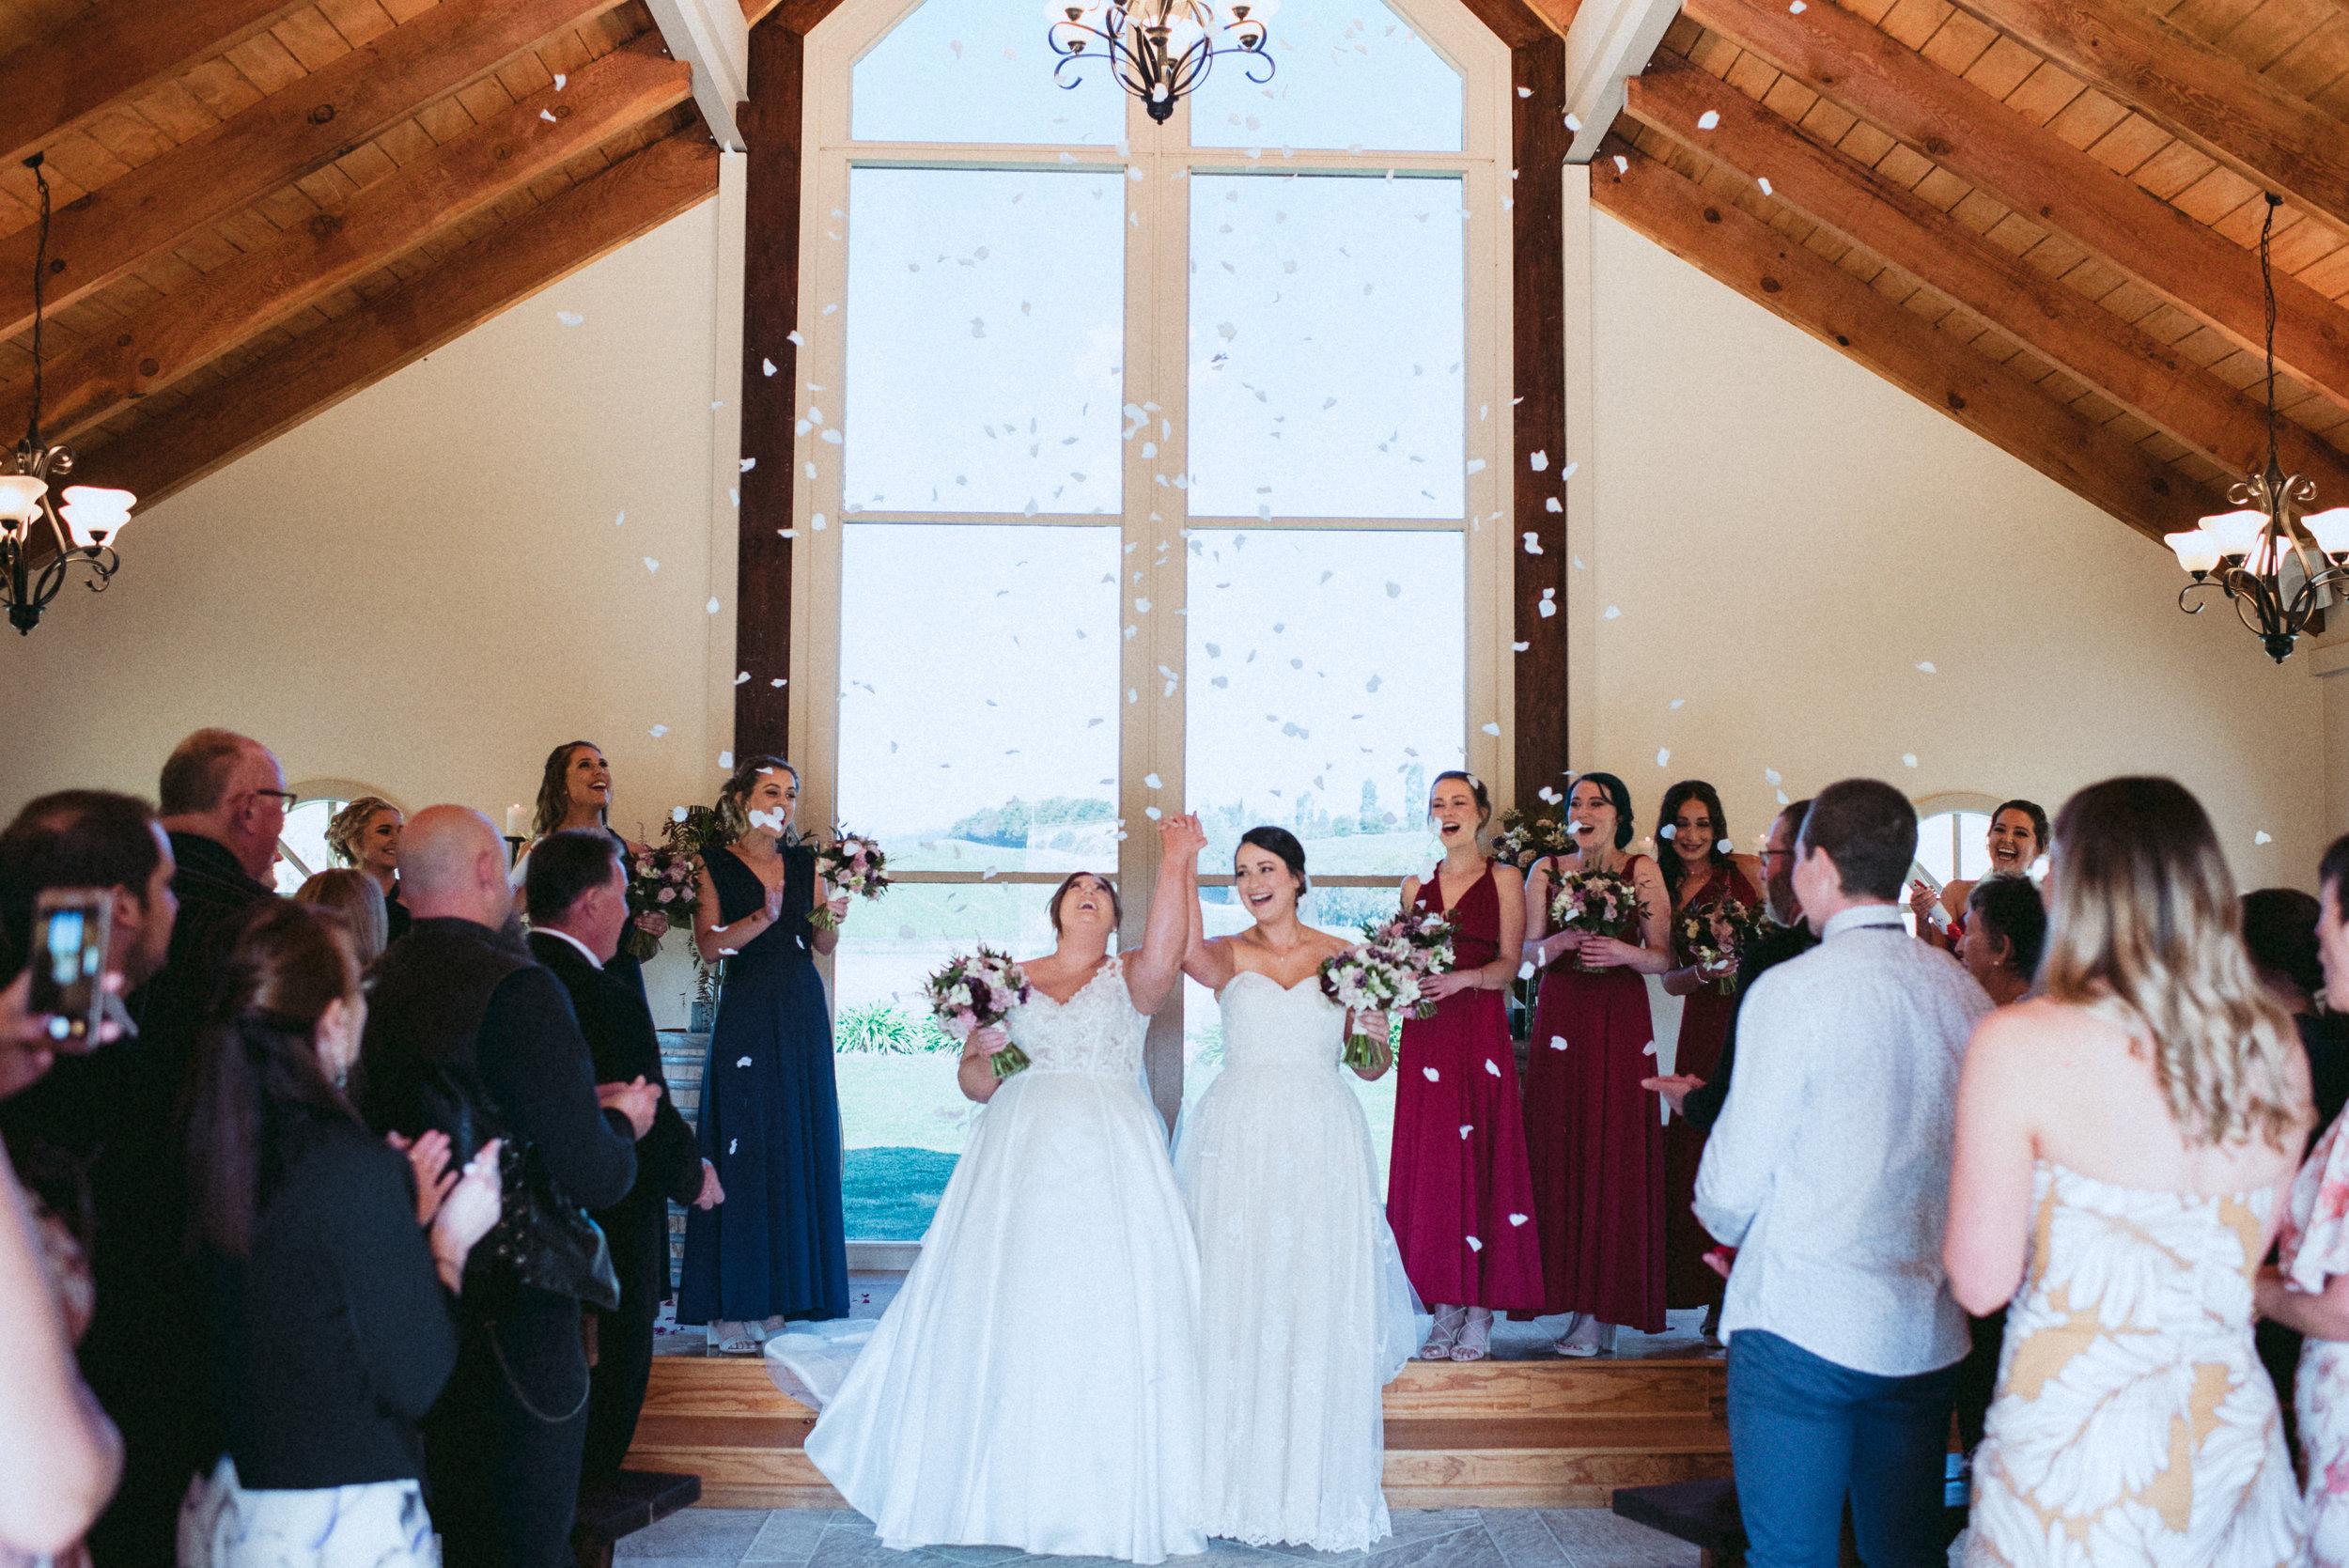 20181028_Abbey_Kate_Wedding-487-Edit-2.jpg